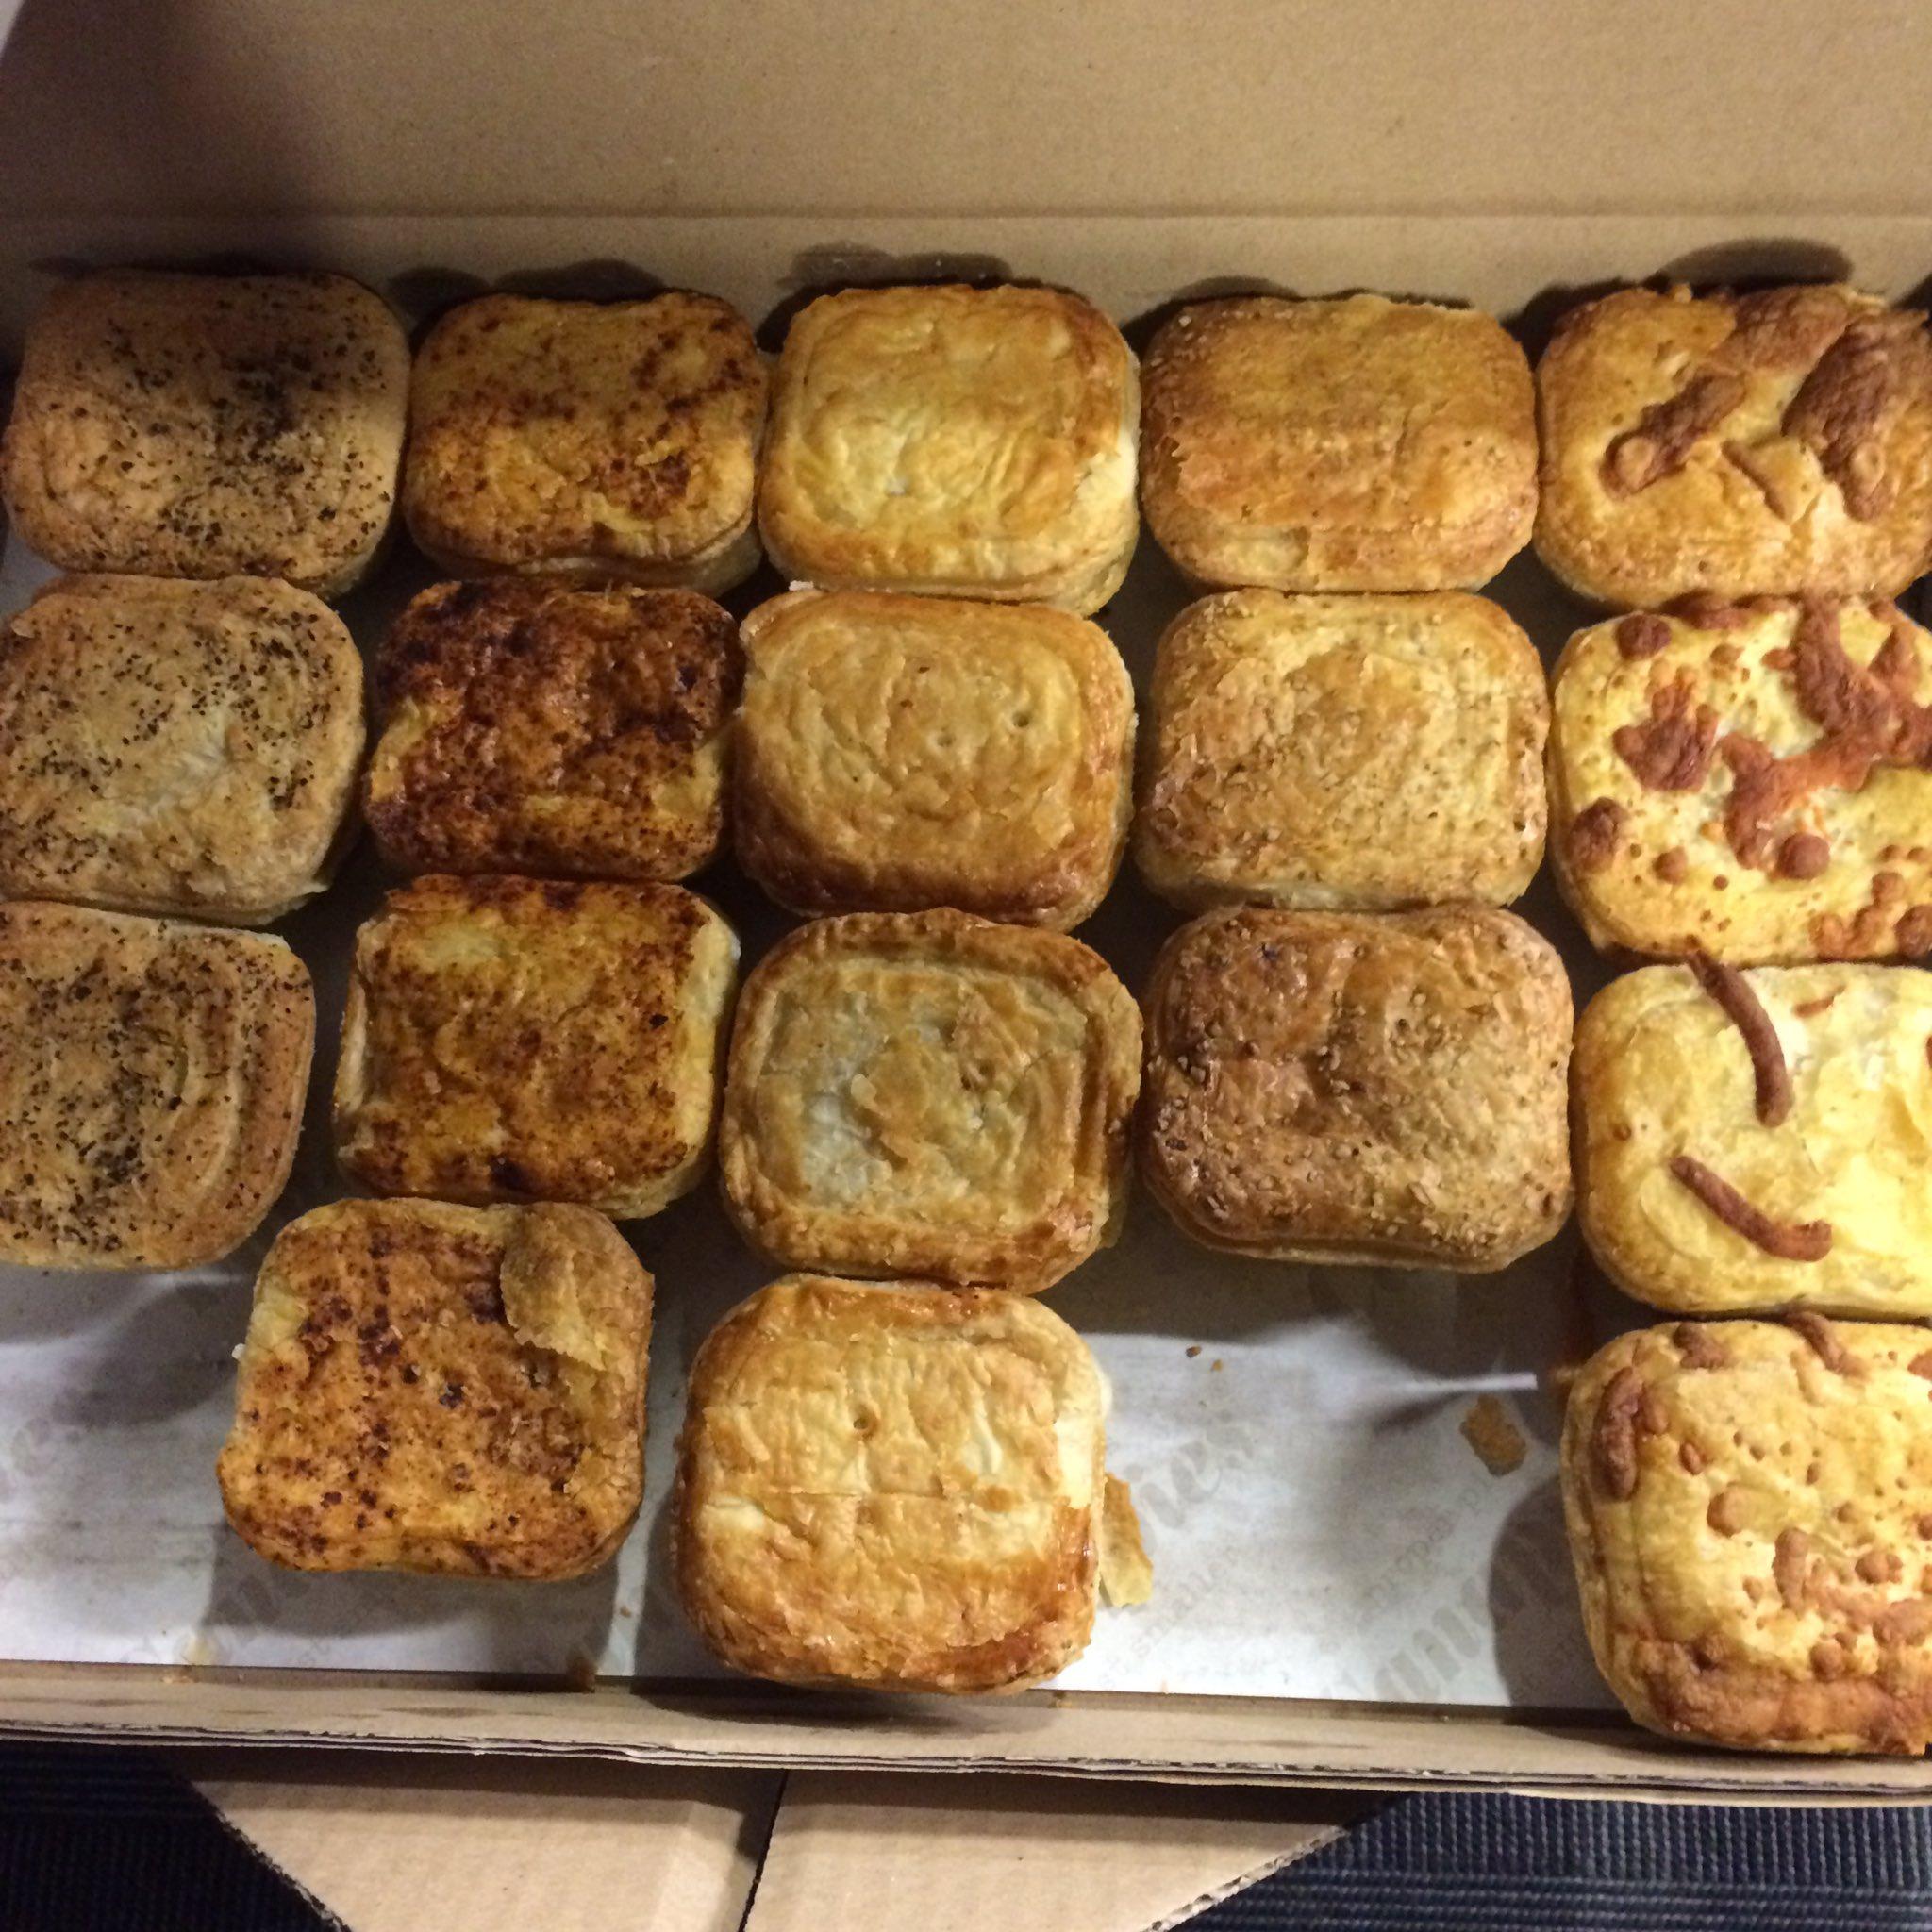 Well that's breakfast sorted. #BritishPieWeek. https://t.co/MA6DKtFXz9